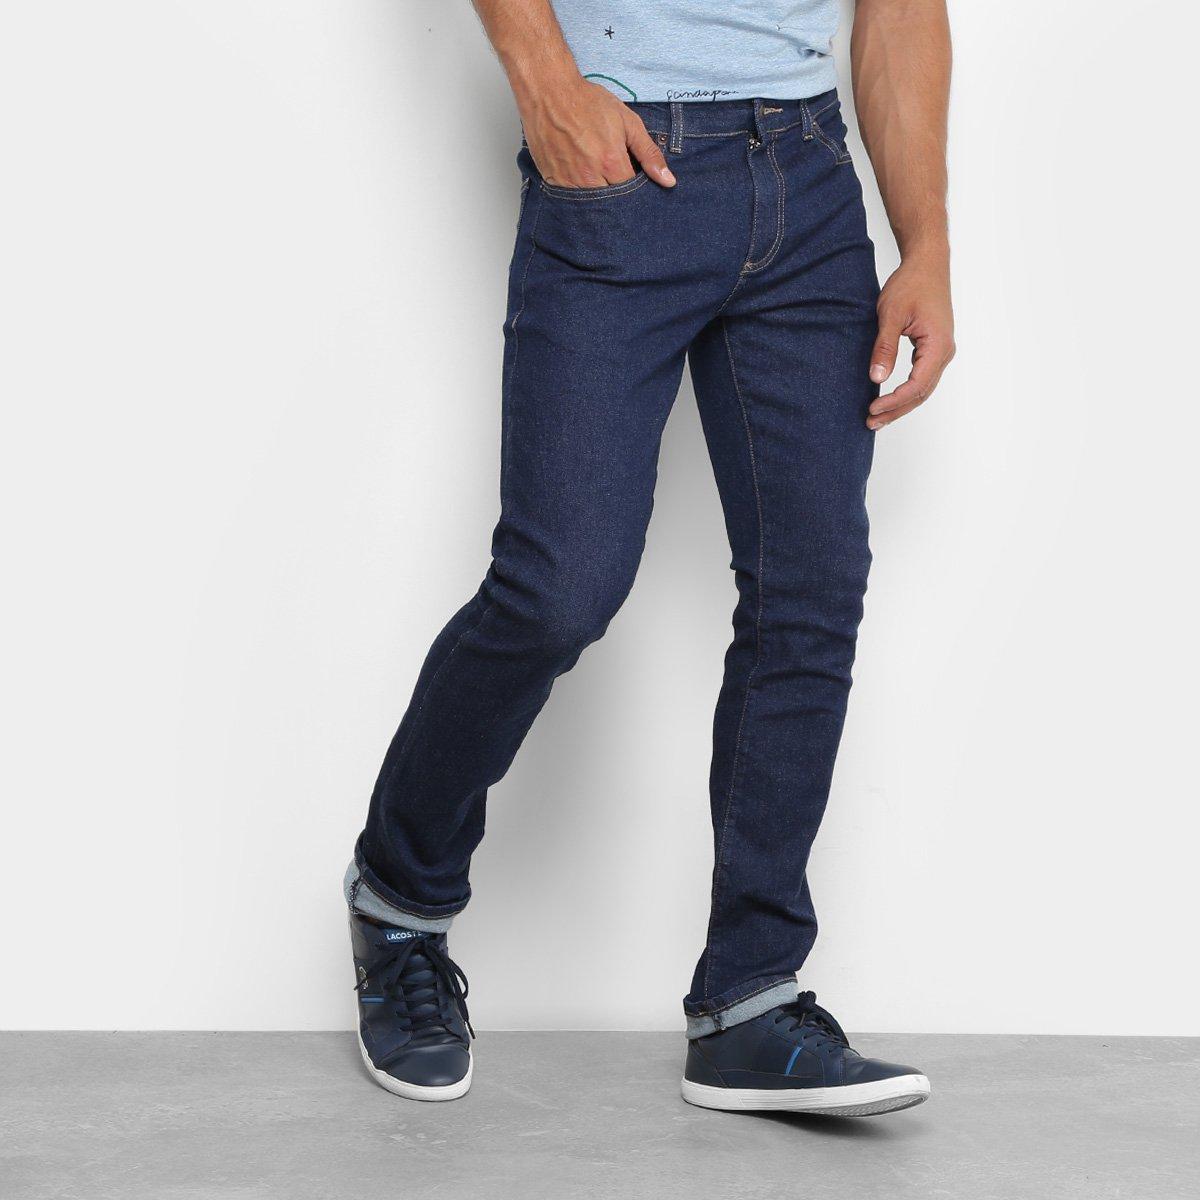 fbc8337d67c Calça Jeans Skinny Lacoste Lavagem Escura Masculina - Compre Agora ...